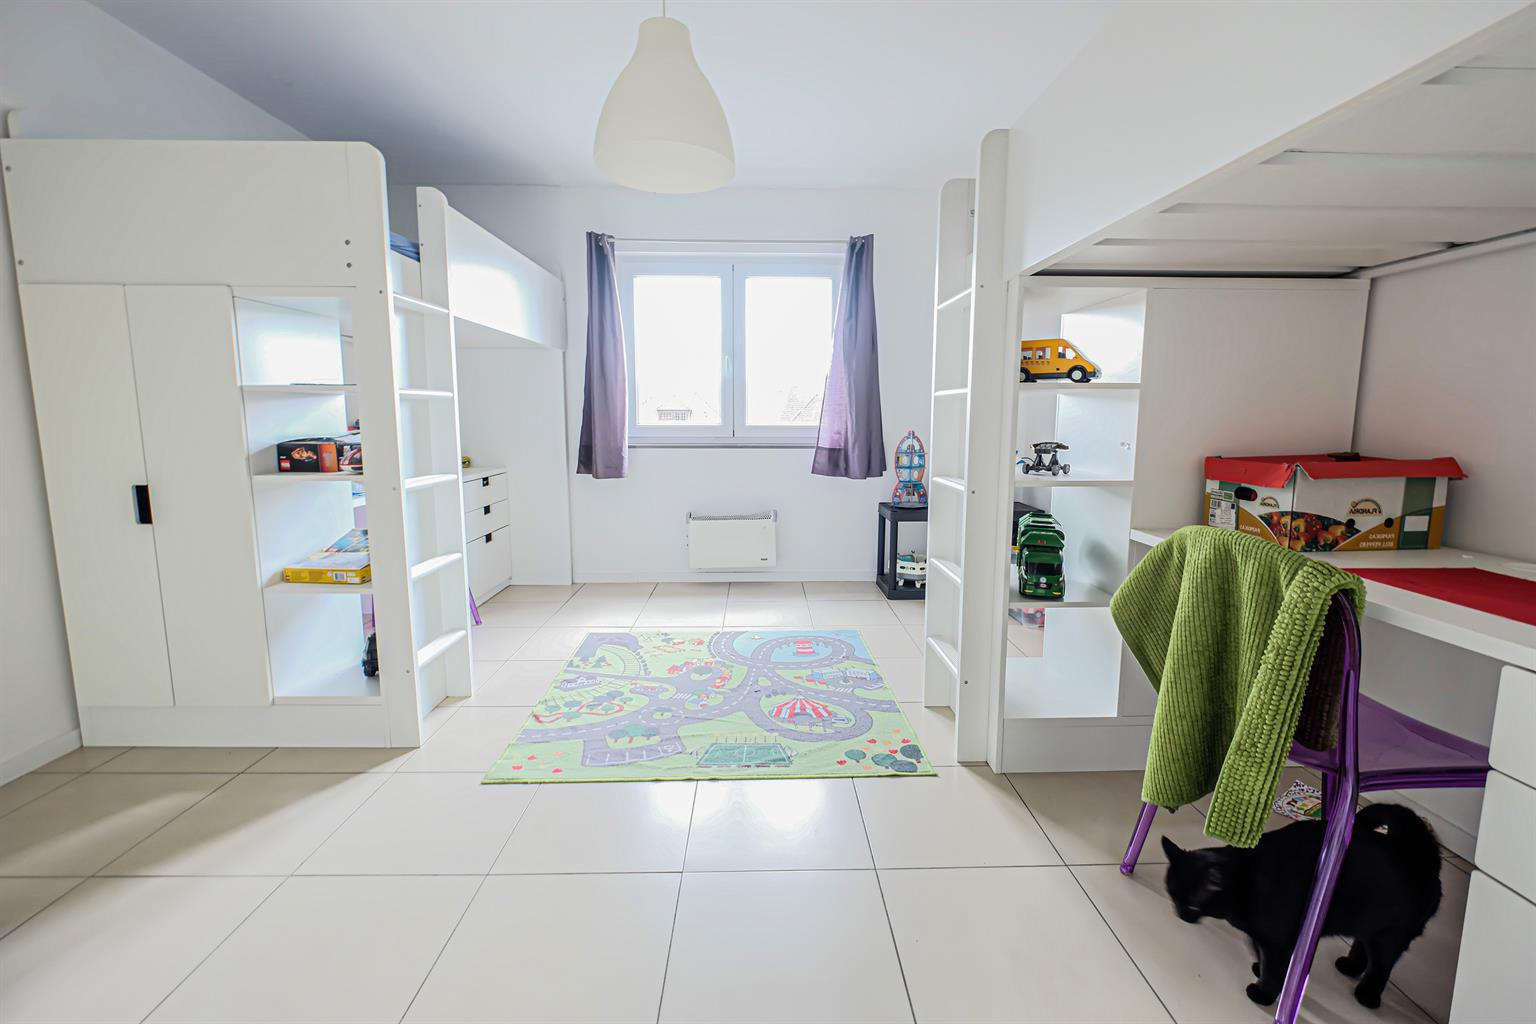 Duplex - Braine-le-Comte - #4384185-8